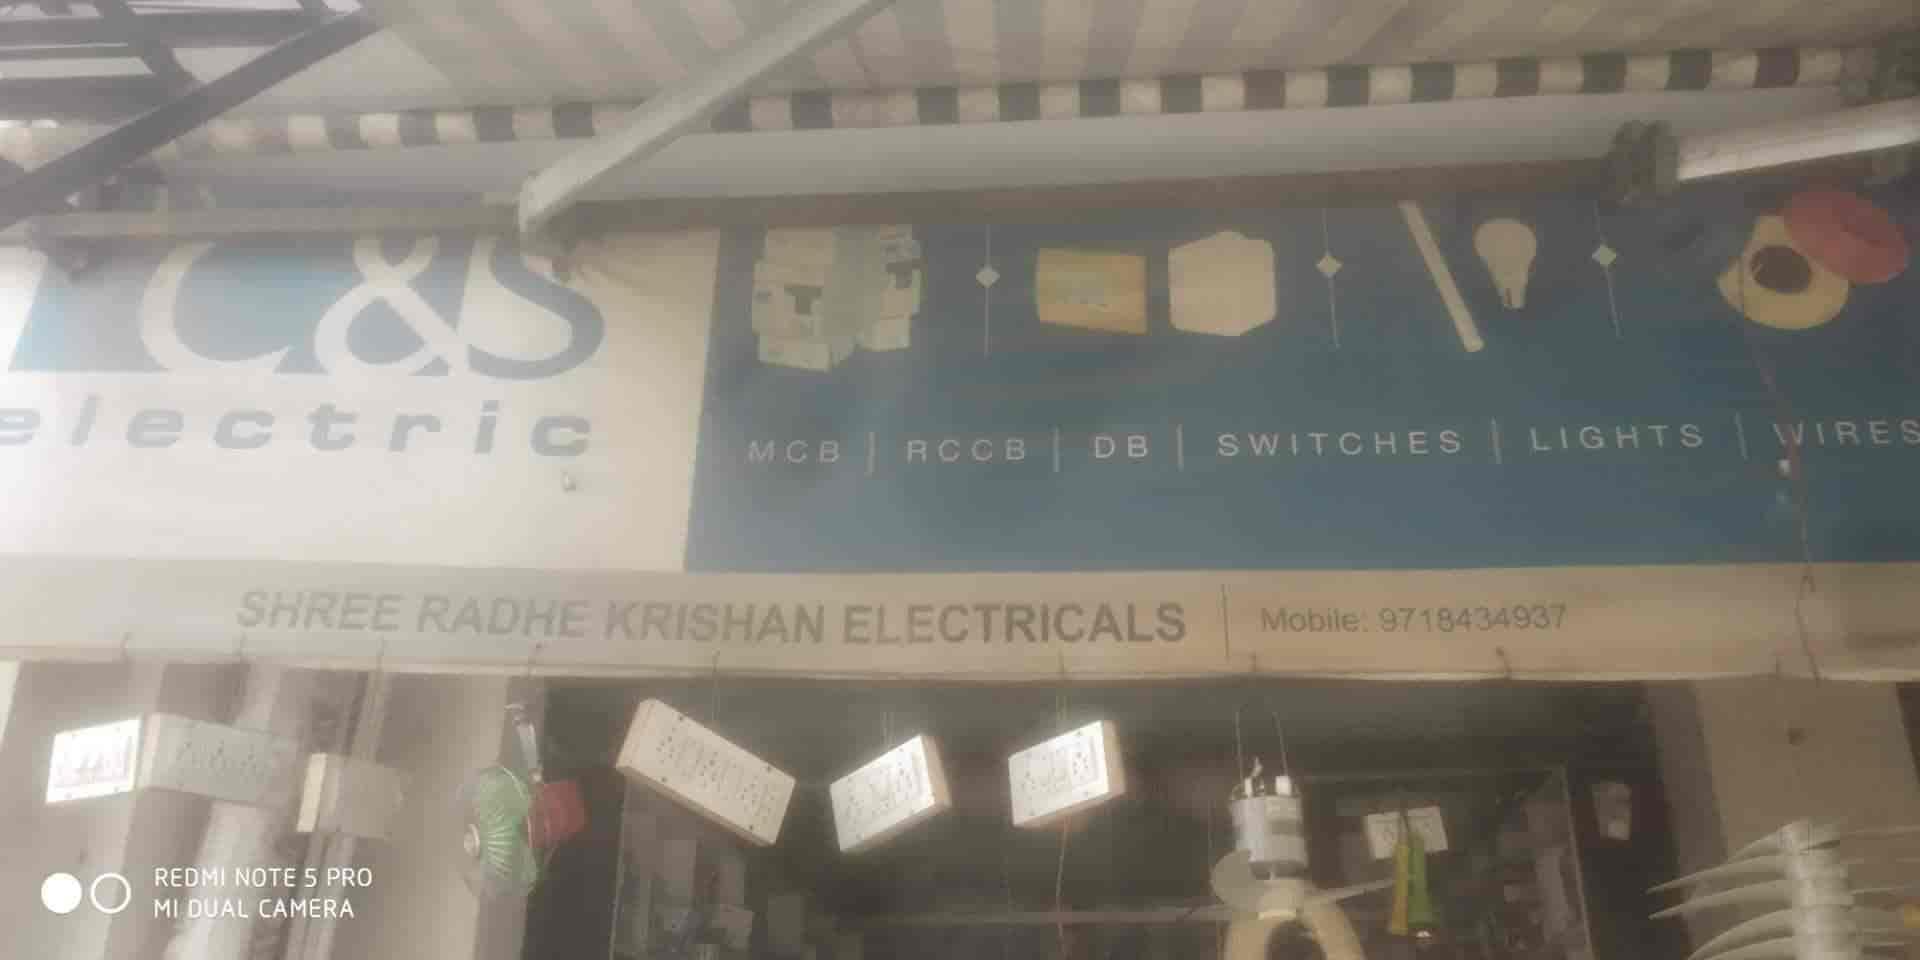 Shree Radhey Krishna Electricals, Dadri - Electrical Shops in Noida